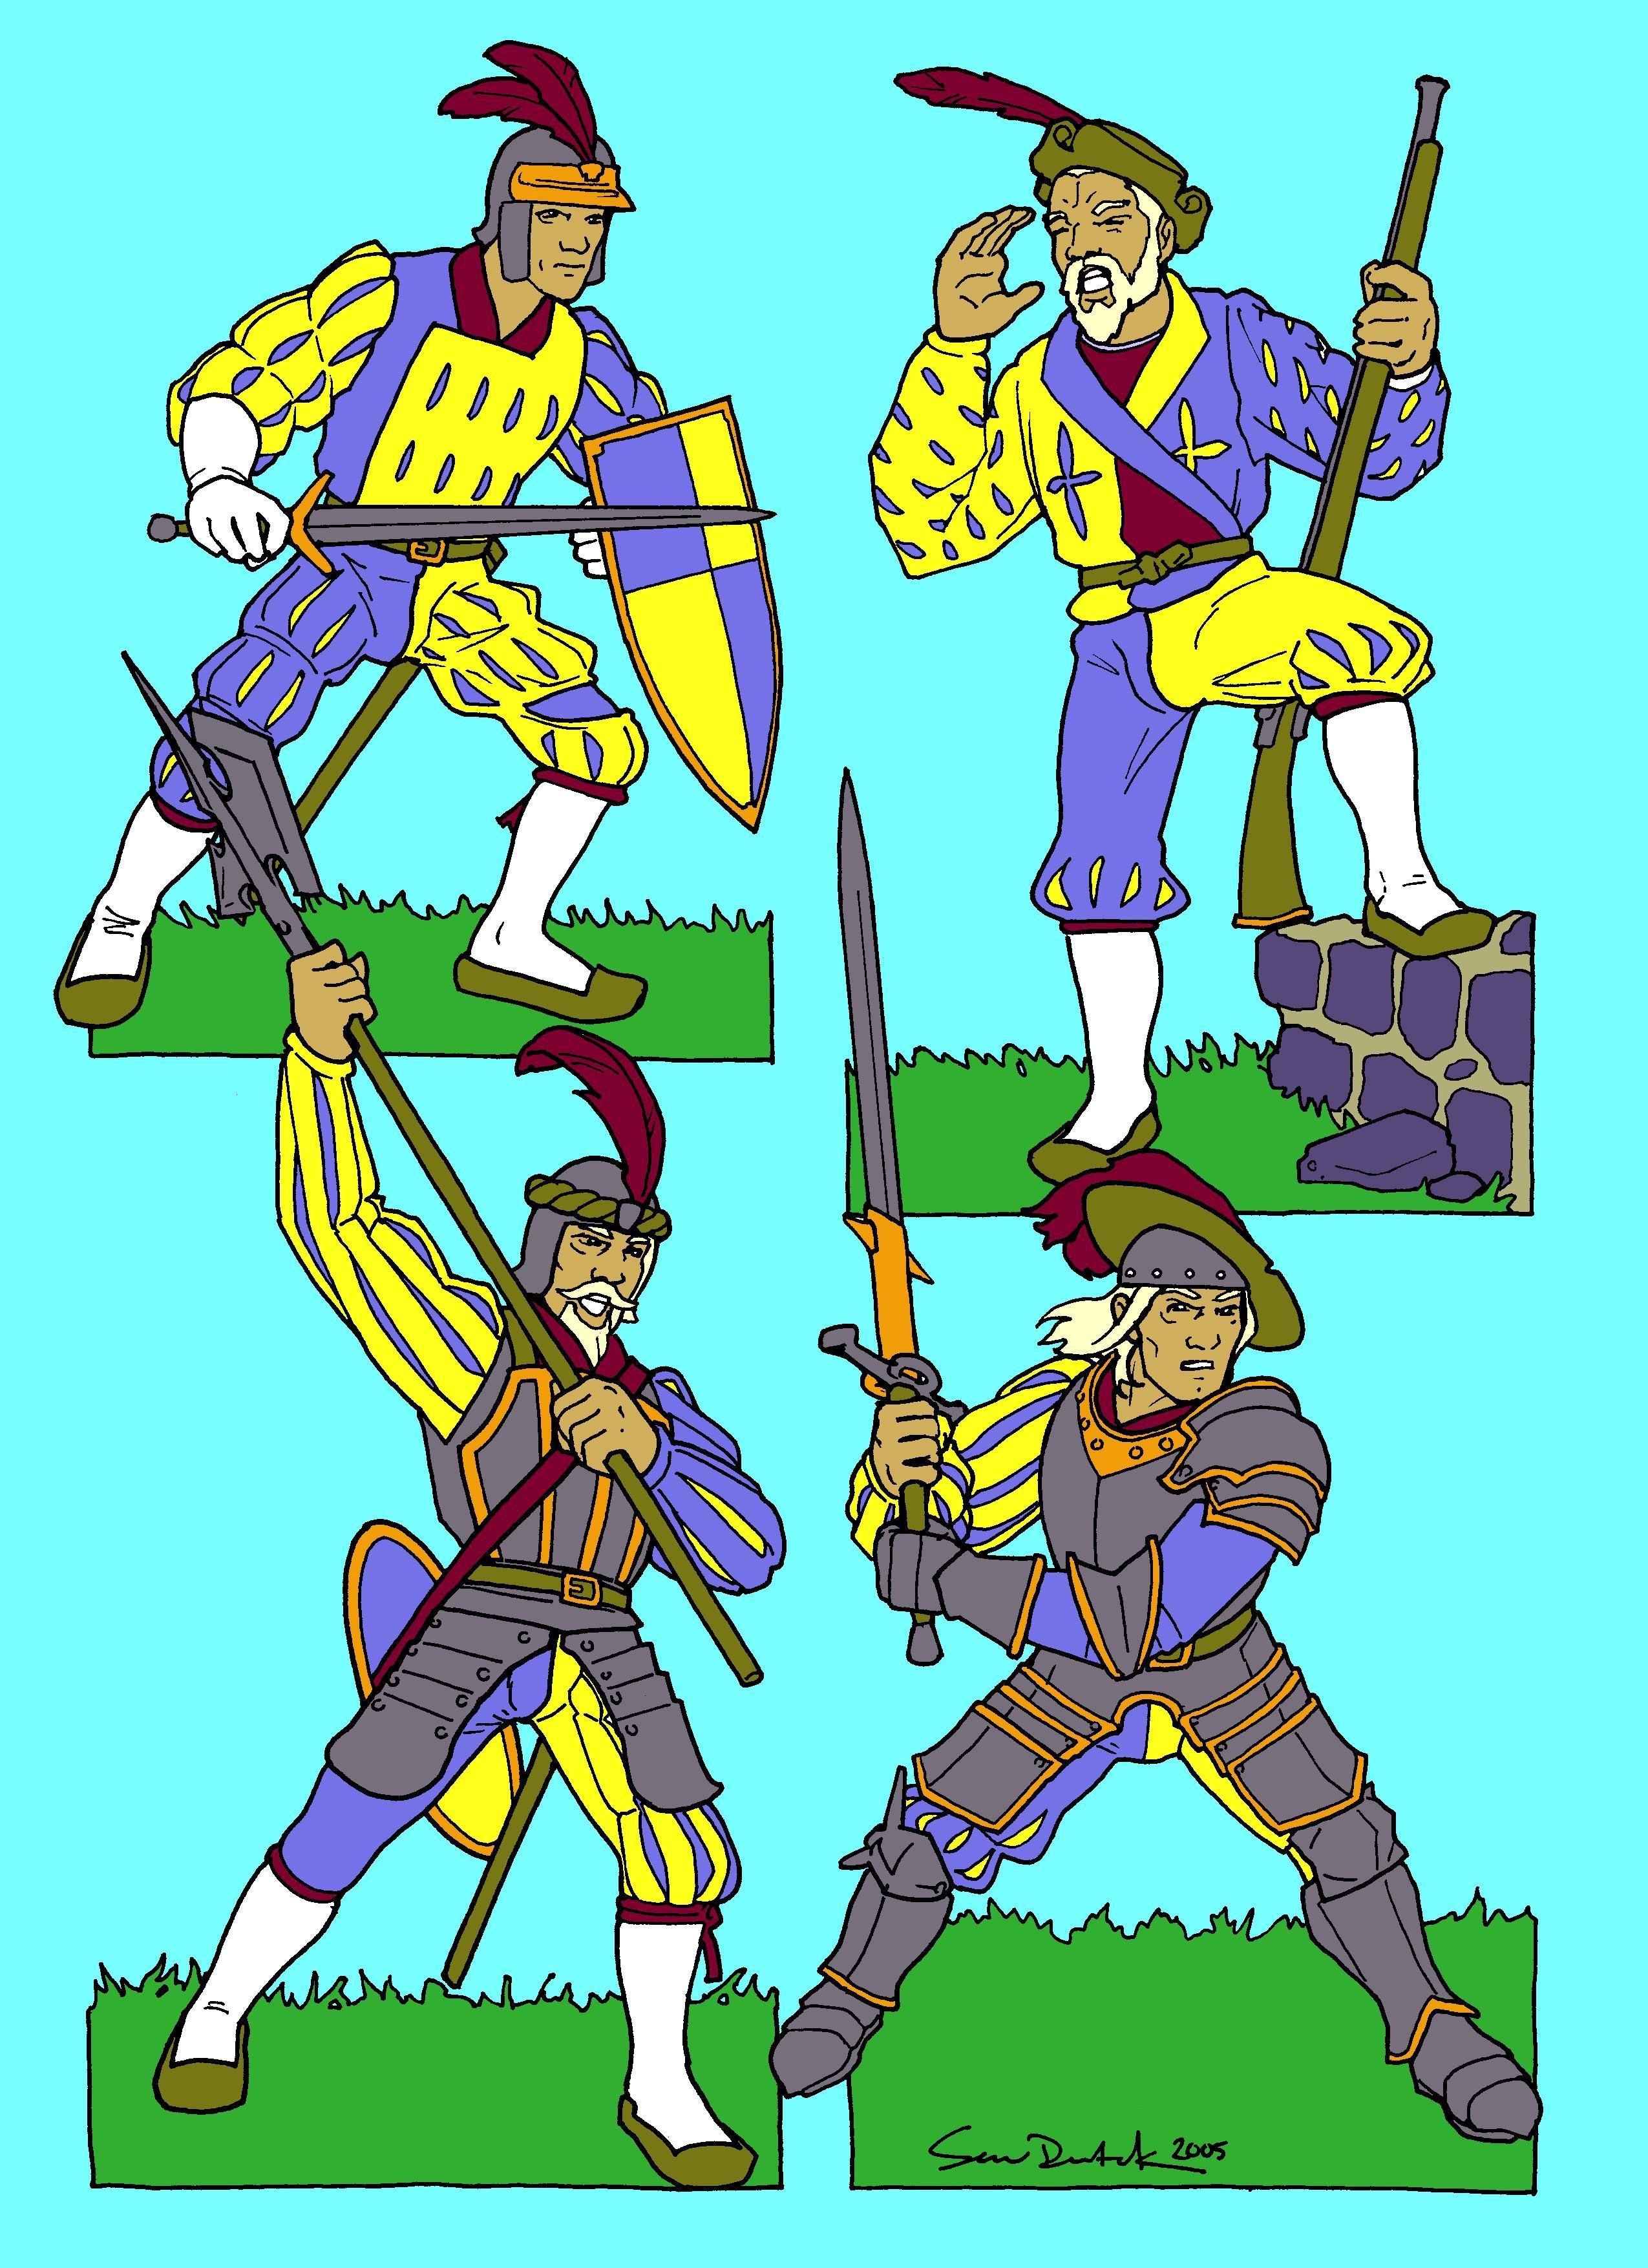 Battle, Empire, Faba, Fantasy Battle, Halberd, Infantry, Nordland, Troops, Warhammer Fantasy, Warriors